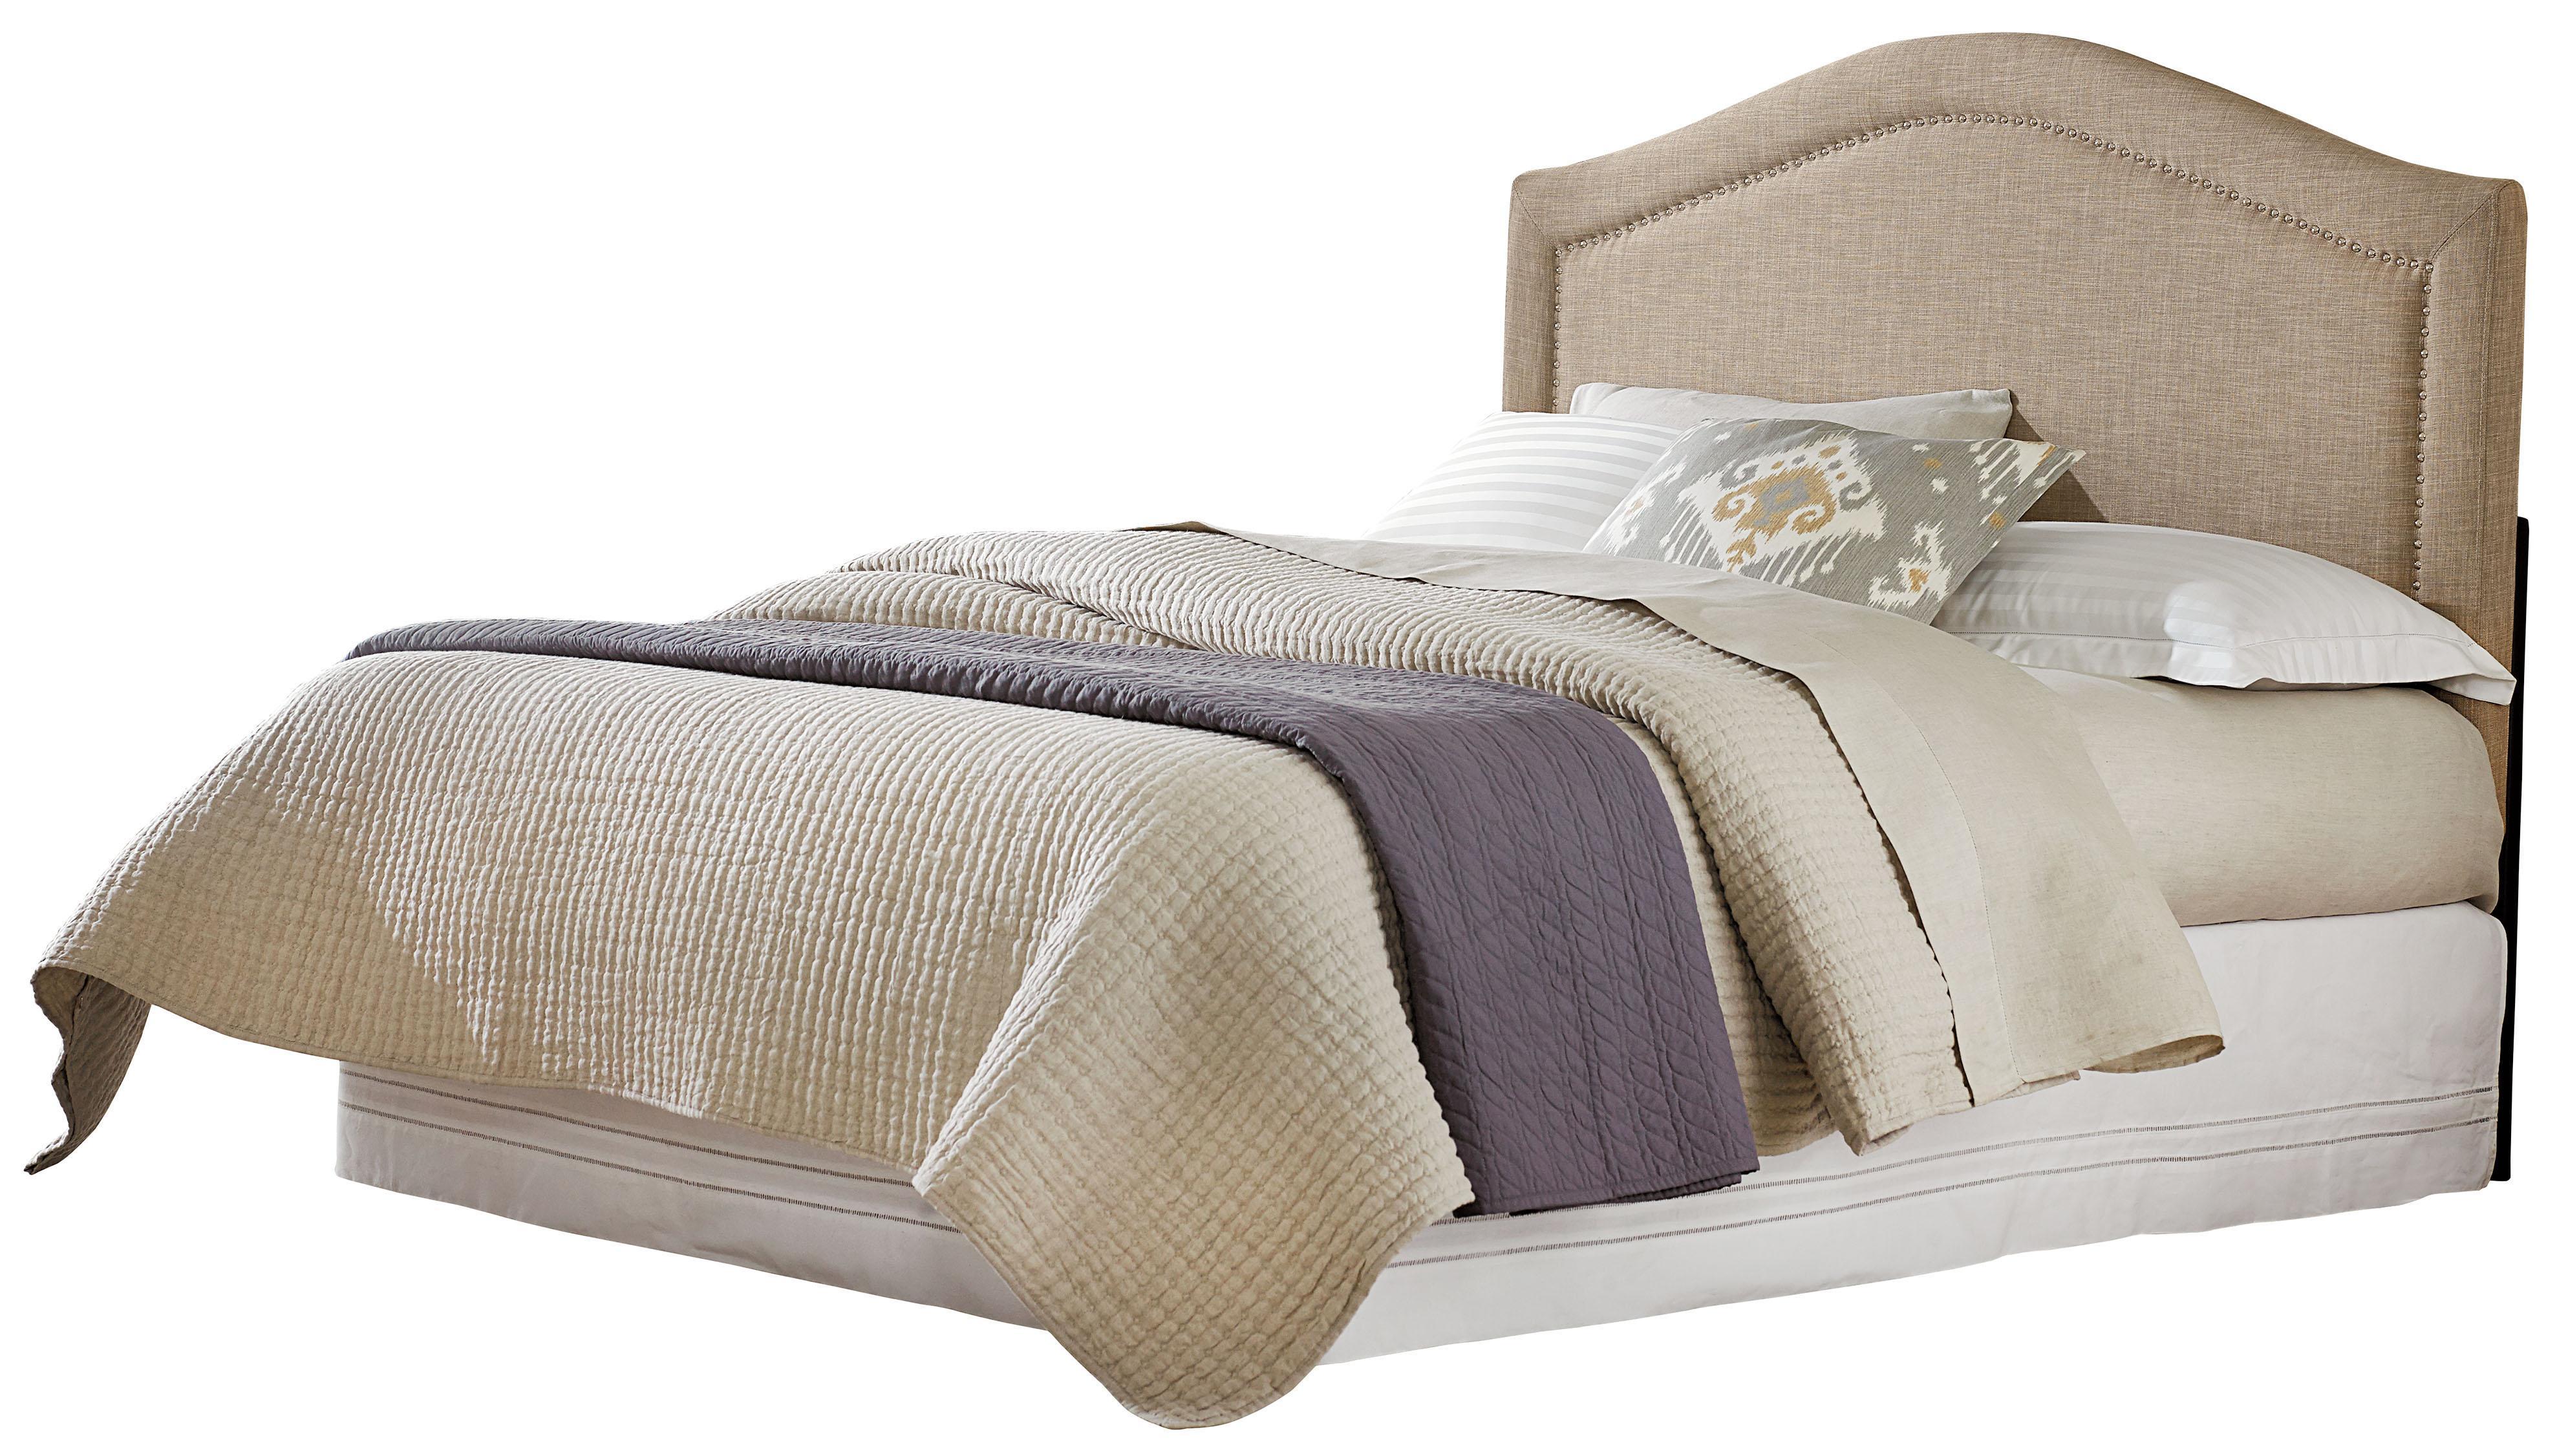 Standard Furniture Simplicity Queen Headboard - Item Number: 81653